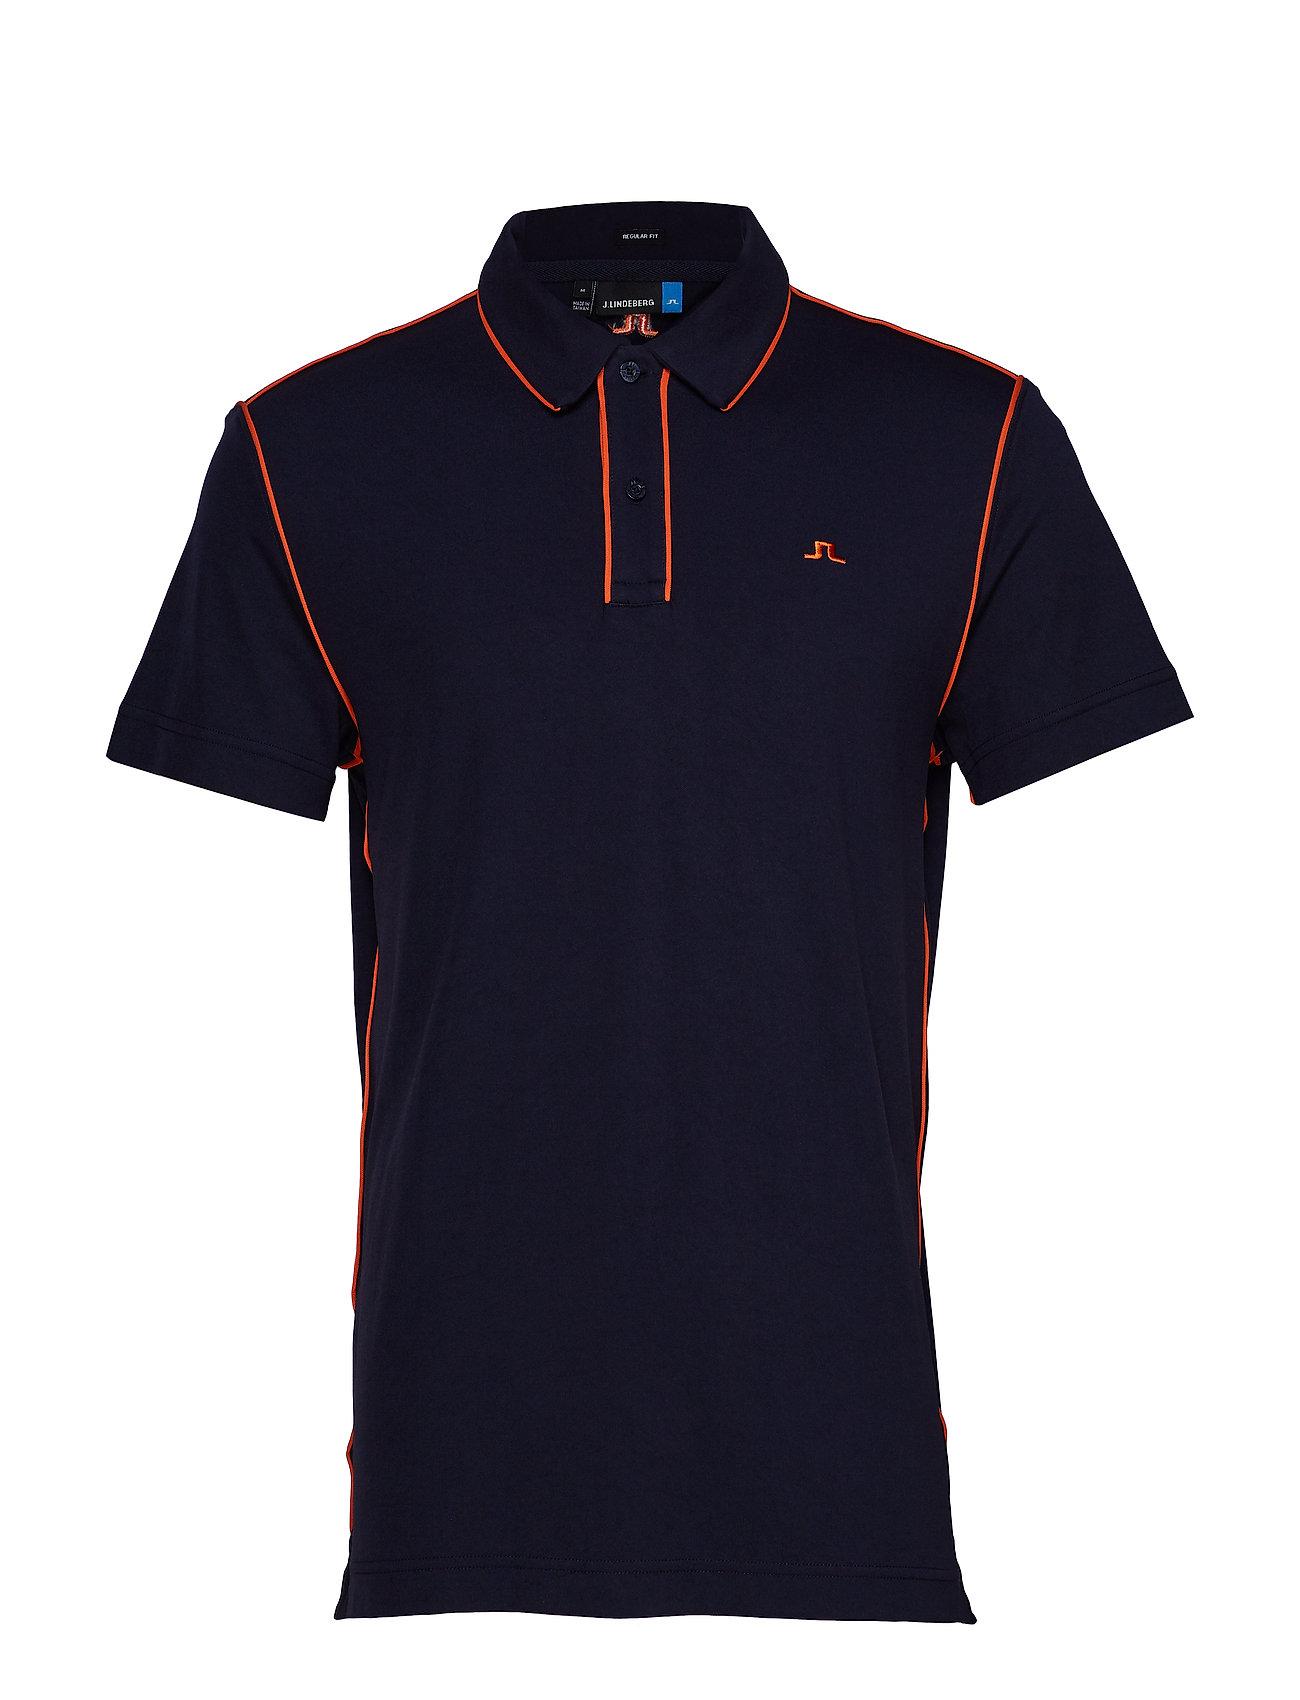 J. Lindeberg Golf Tomi Reg fit-Lux Piquet - JL NAVY